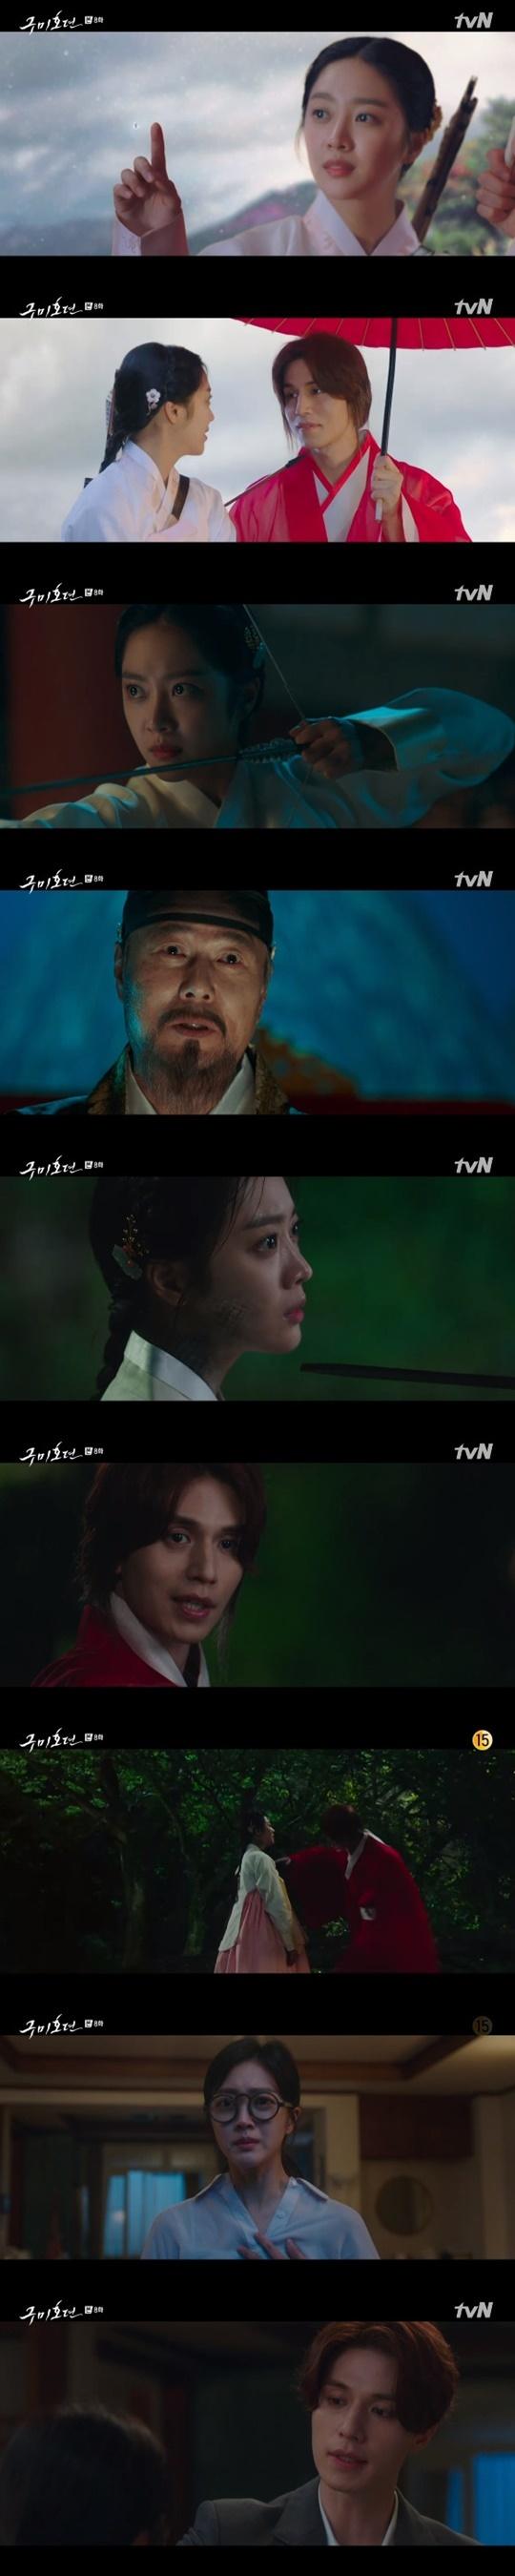 [RE:TV] '구미호뎐' 전생 속 조보아, 이무기 빙의 자처…이동욱과 혈투